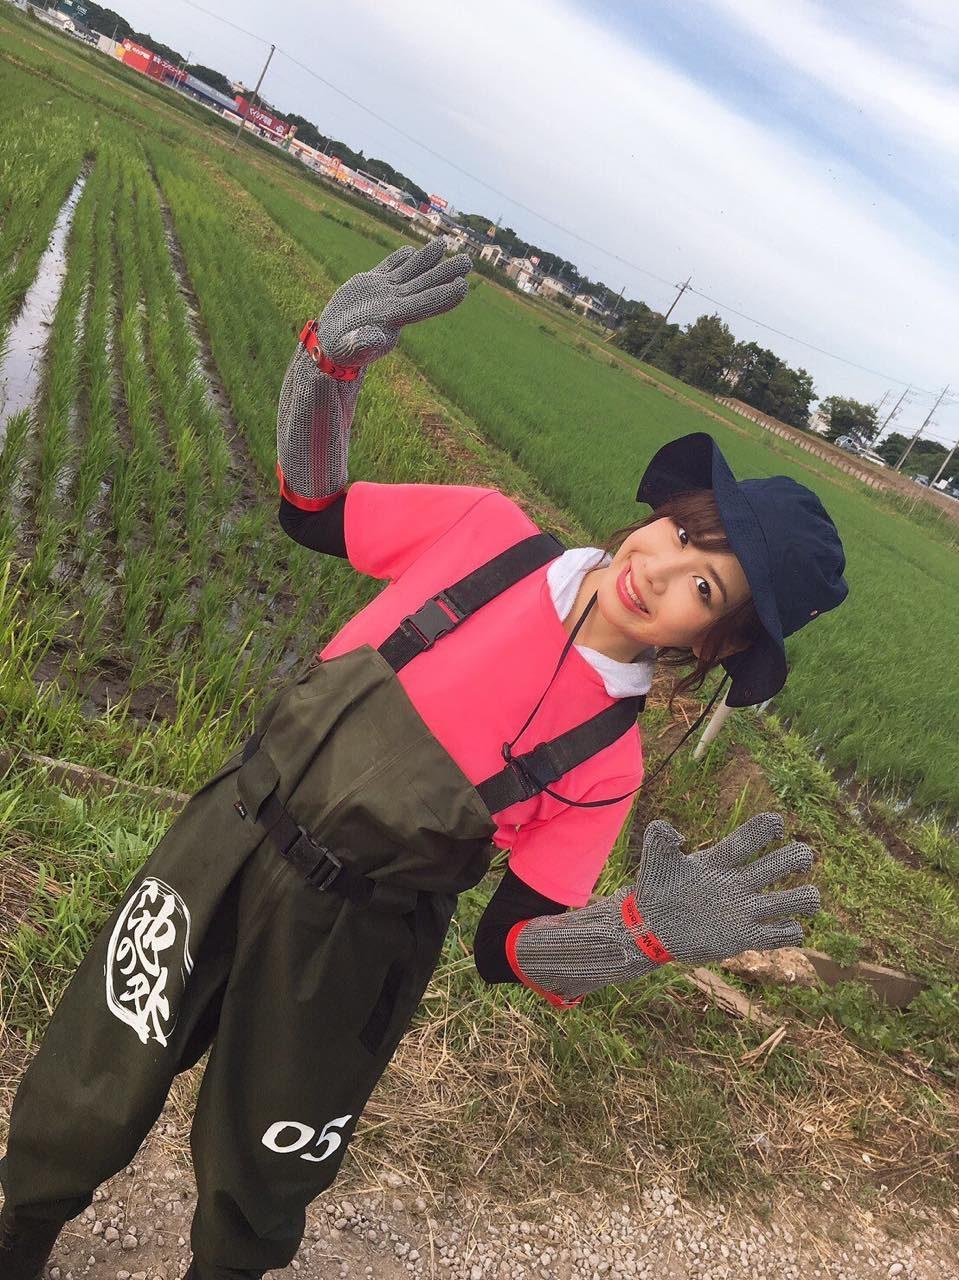 AKB48 大家志津香が出演、地獄の水路で大量捕獲 巨大怪獣デカガメラ! テレ東「緊急SOS!池の水ぜんぶ抜く大作戦」 [6/16 19:54~]